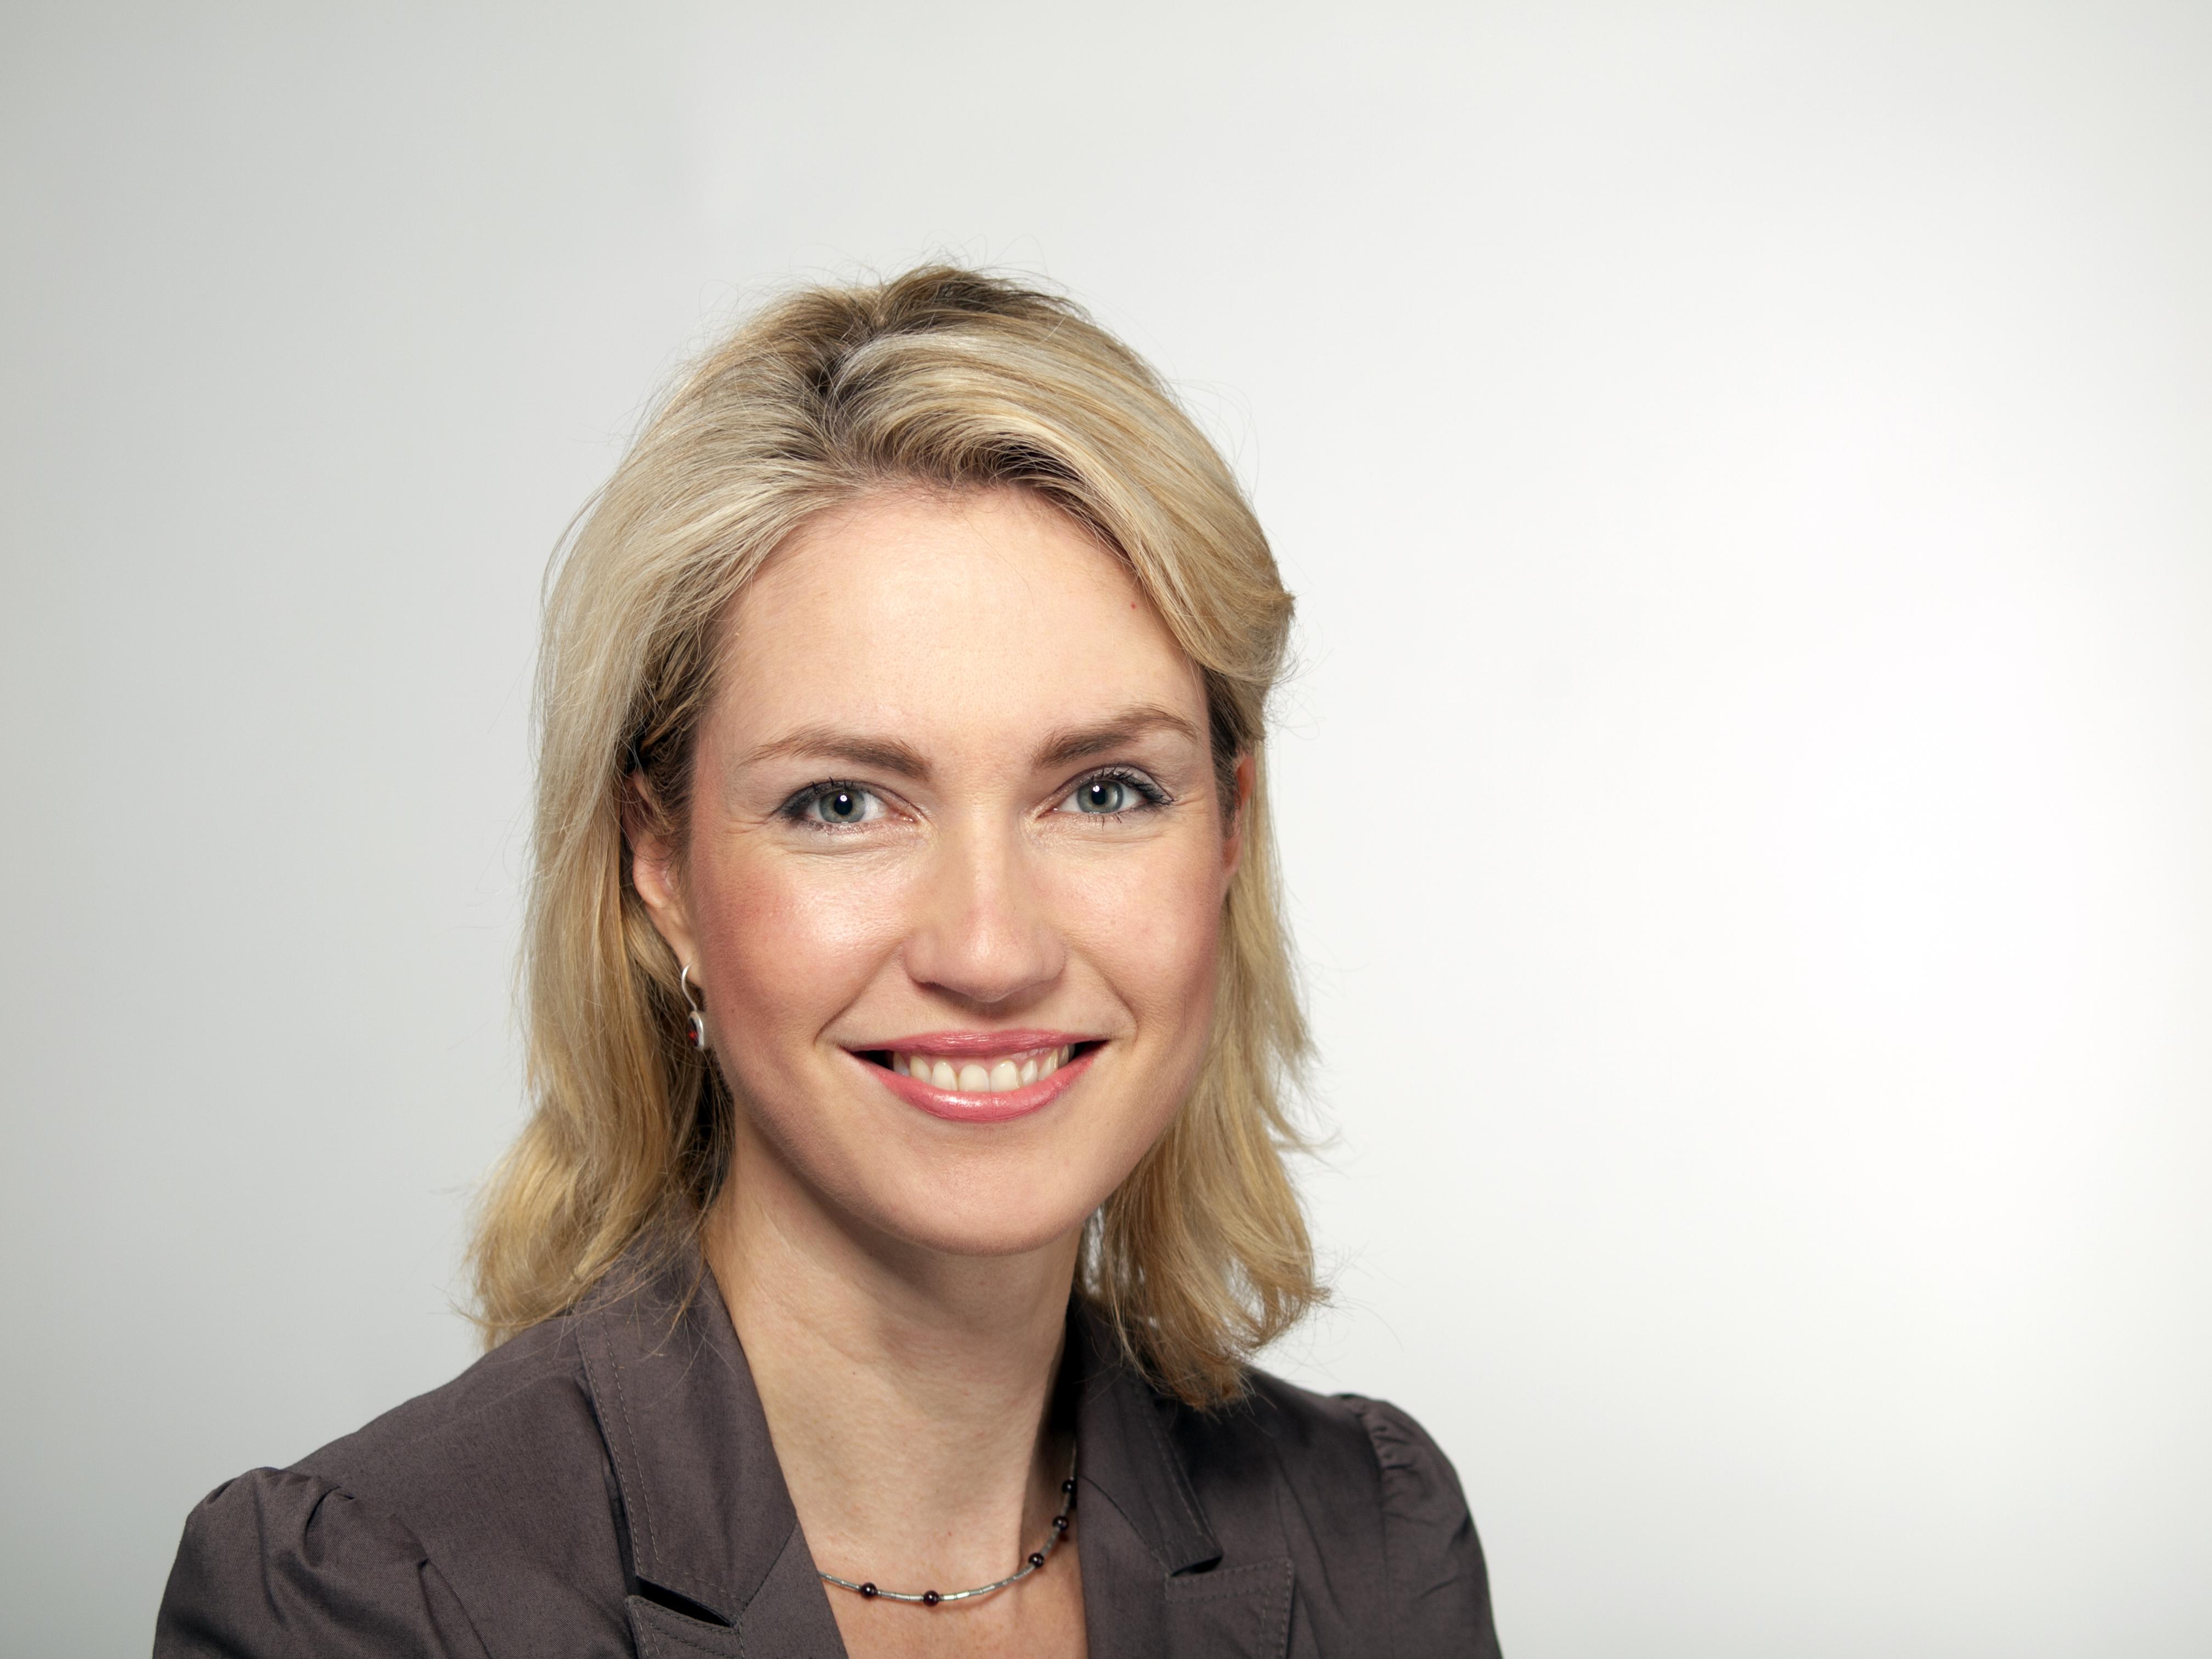 Manuela Schwesig Orlando Bloom Wikipedia